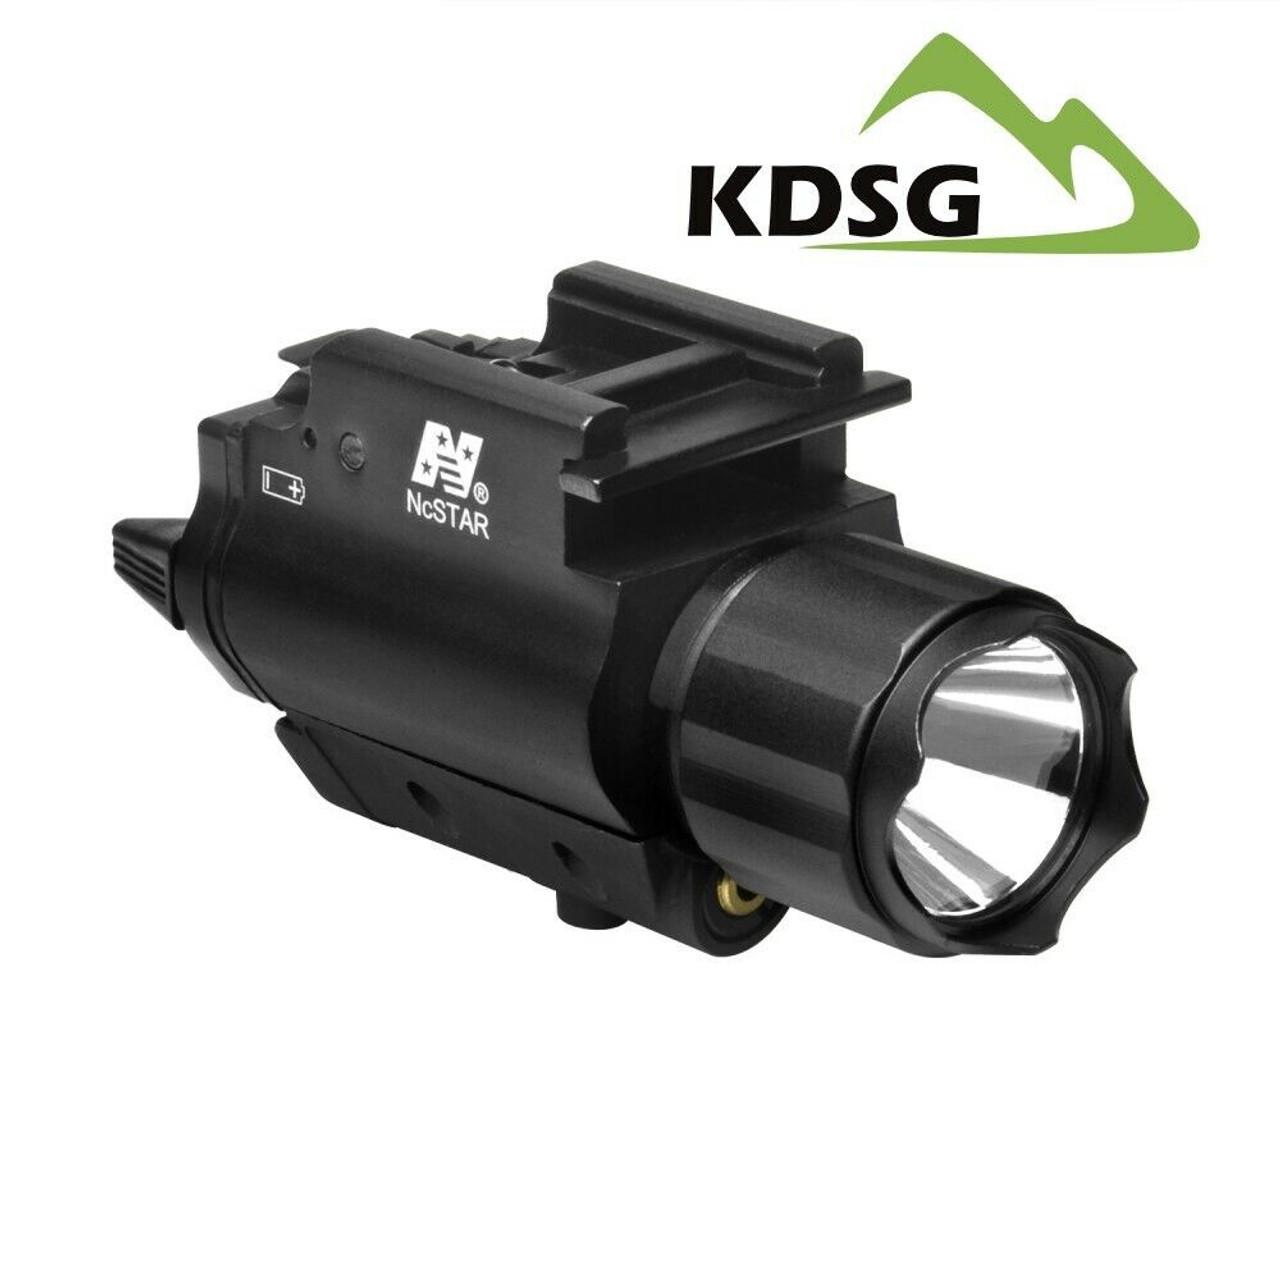 NcSTAR AQPFLSG 3W Ultra Bright 200 Lumen CREE® LED flashlight and Green Laser